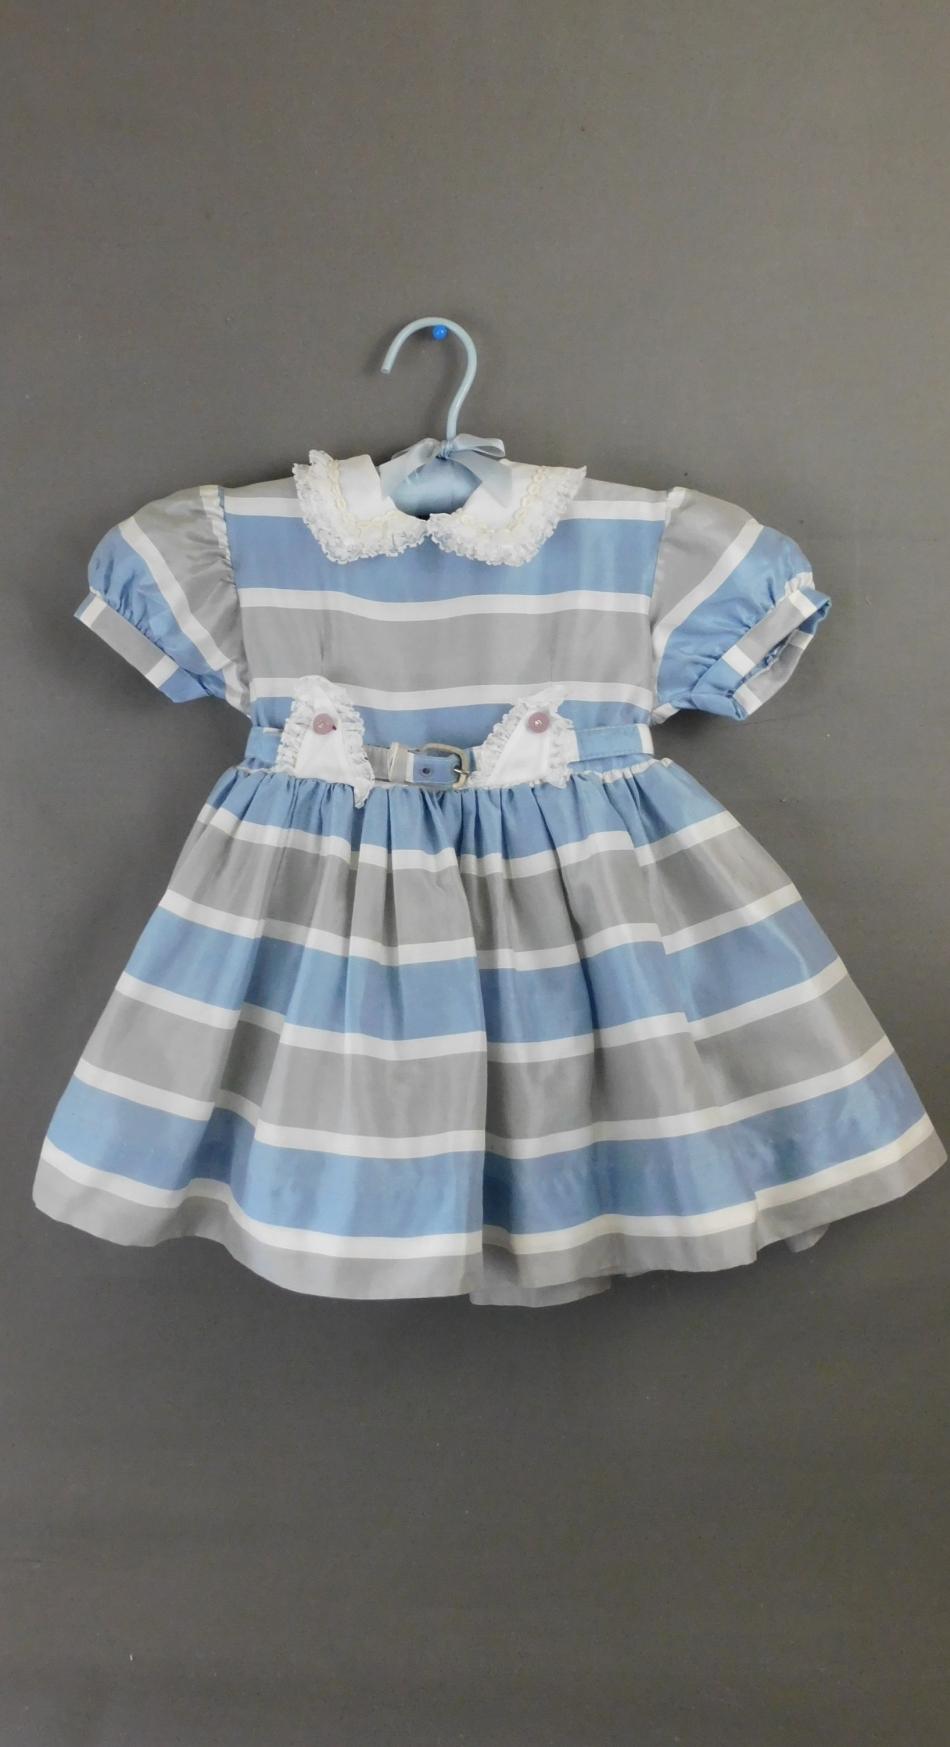 Vintage 1950s Little Girl Dress Blue & Grey Striped, Full Skirt with Crinoline, 22 inch chest